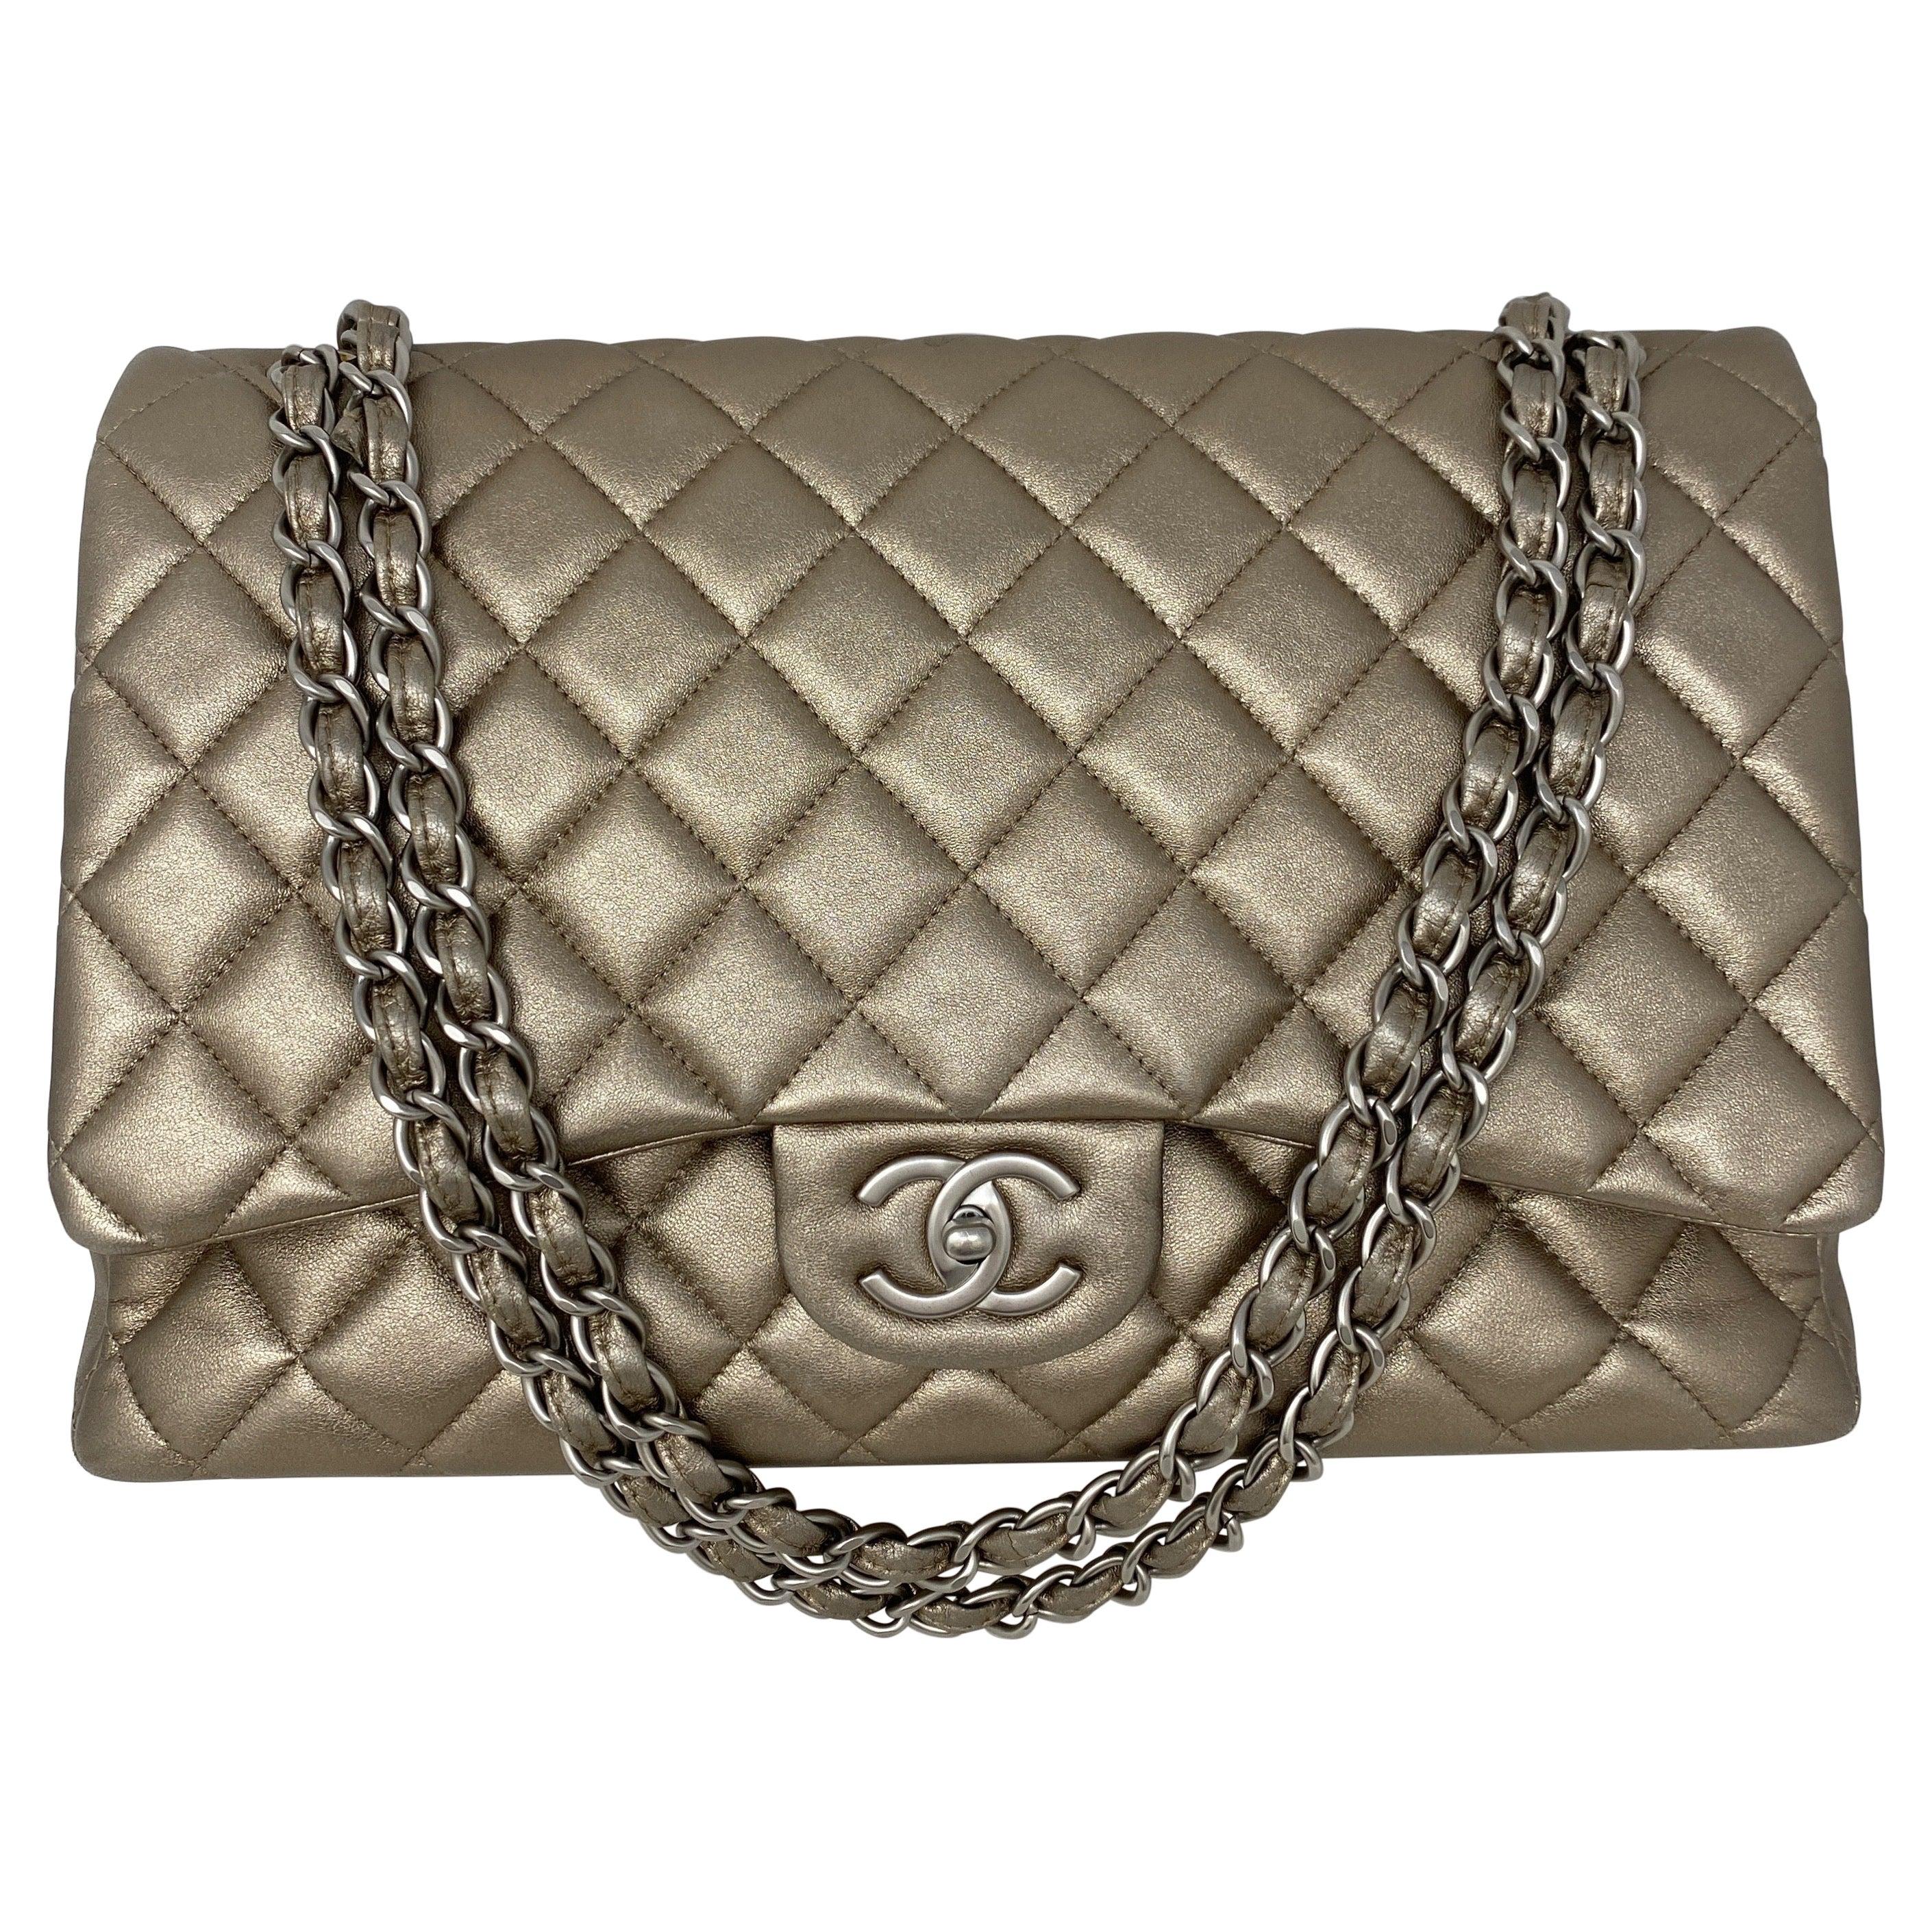 Chanel Bronze Metallic Maxi Bag